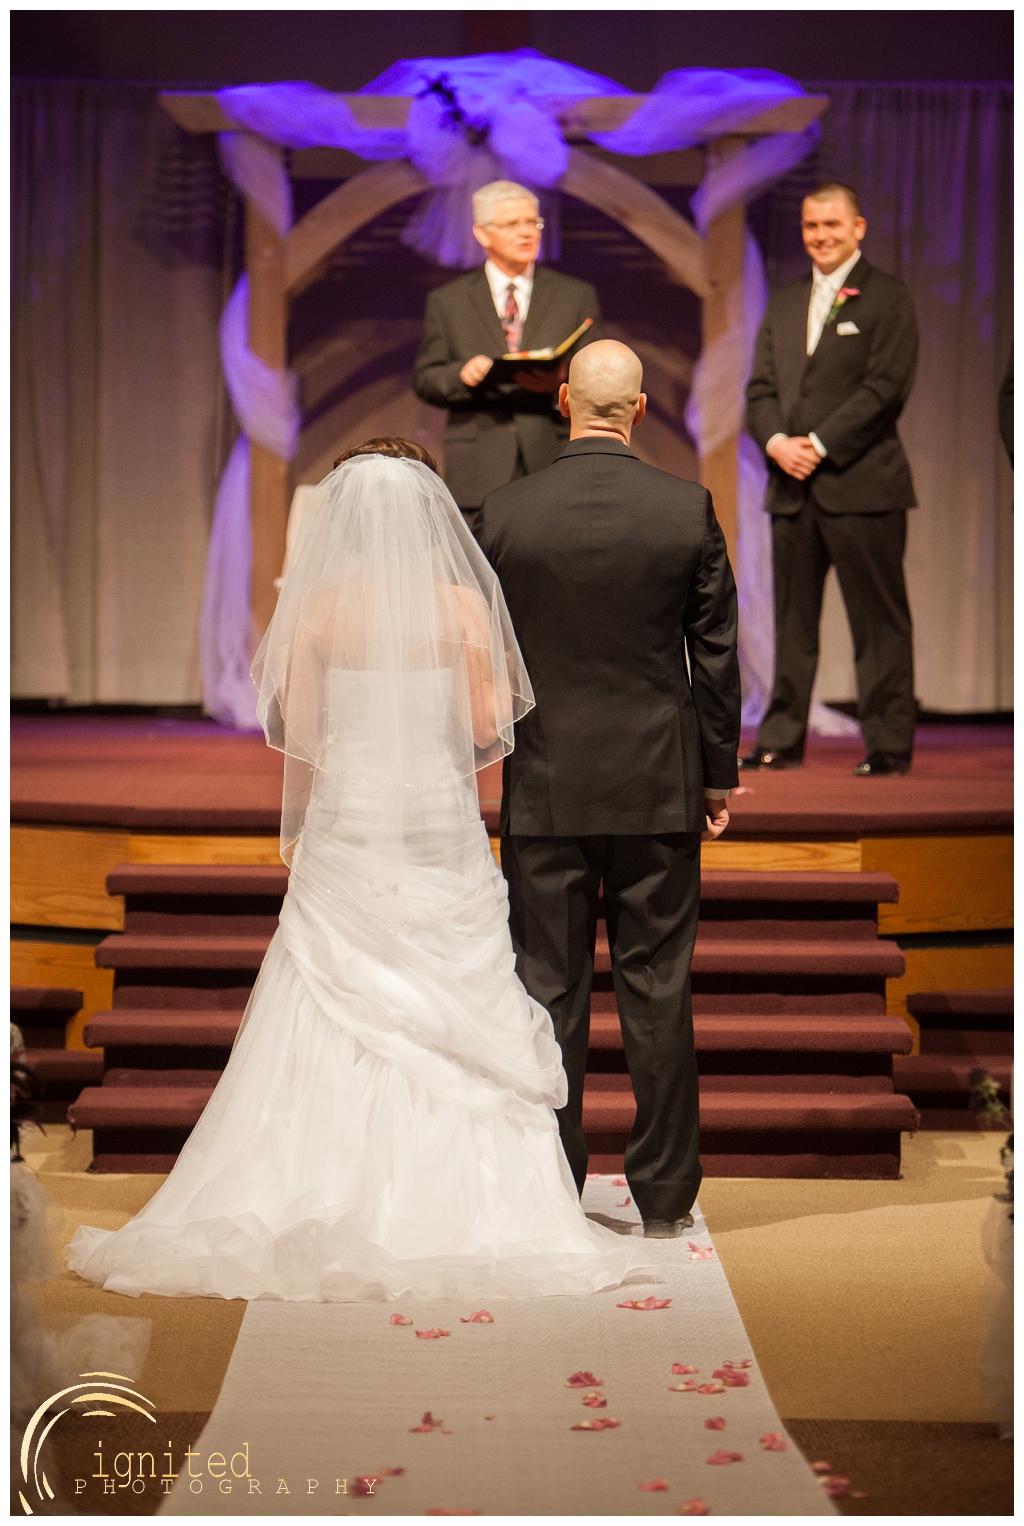 ignited Photography Alyssa  Castwell and Caleb Merna Wedding Brighton Nazarene The Naz Howell MI_0032.jpg